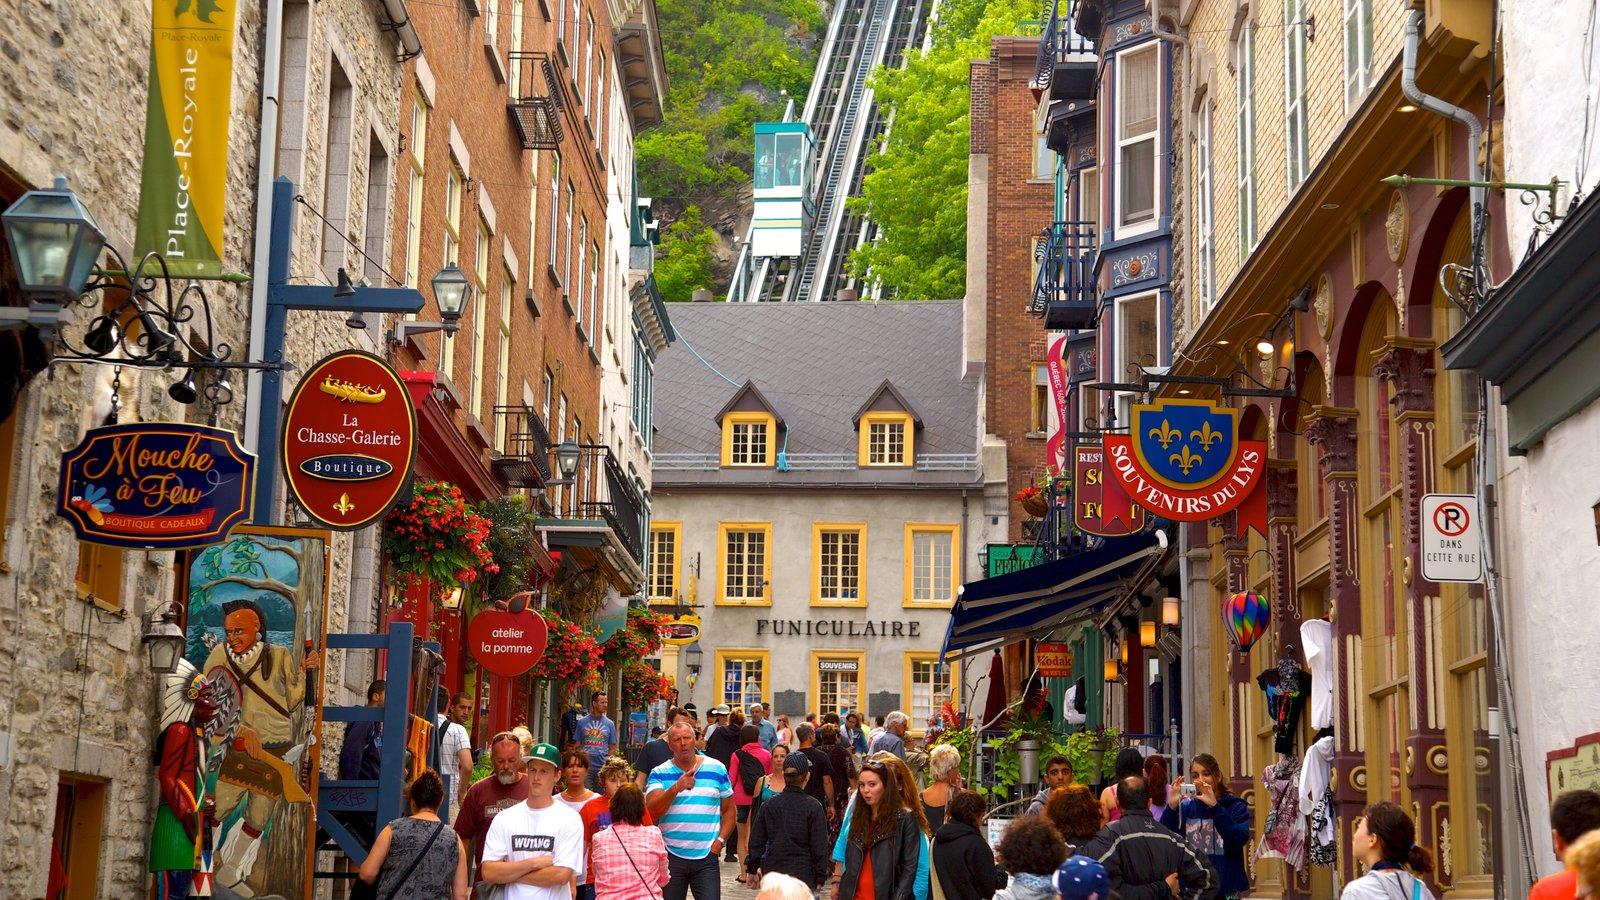 Fotos De Casco Antiguo De Quebec Ver Fotos E Im 195 161 Genes De Casco Antiguo De Quebec